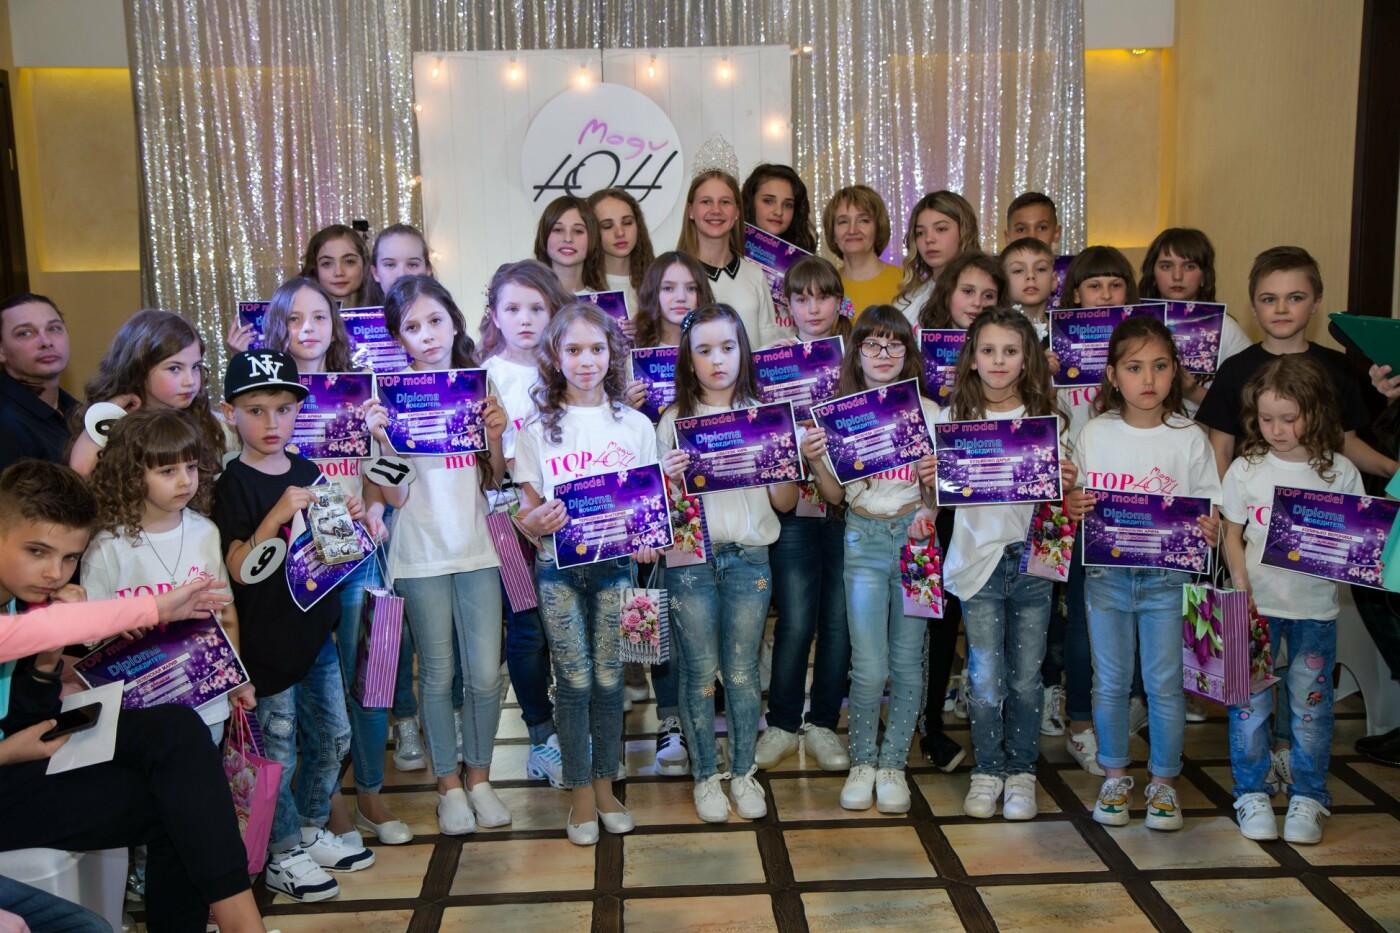 В Константиновке состоится конкурс «Мини-мисс Константиновка 2019», фото-3